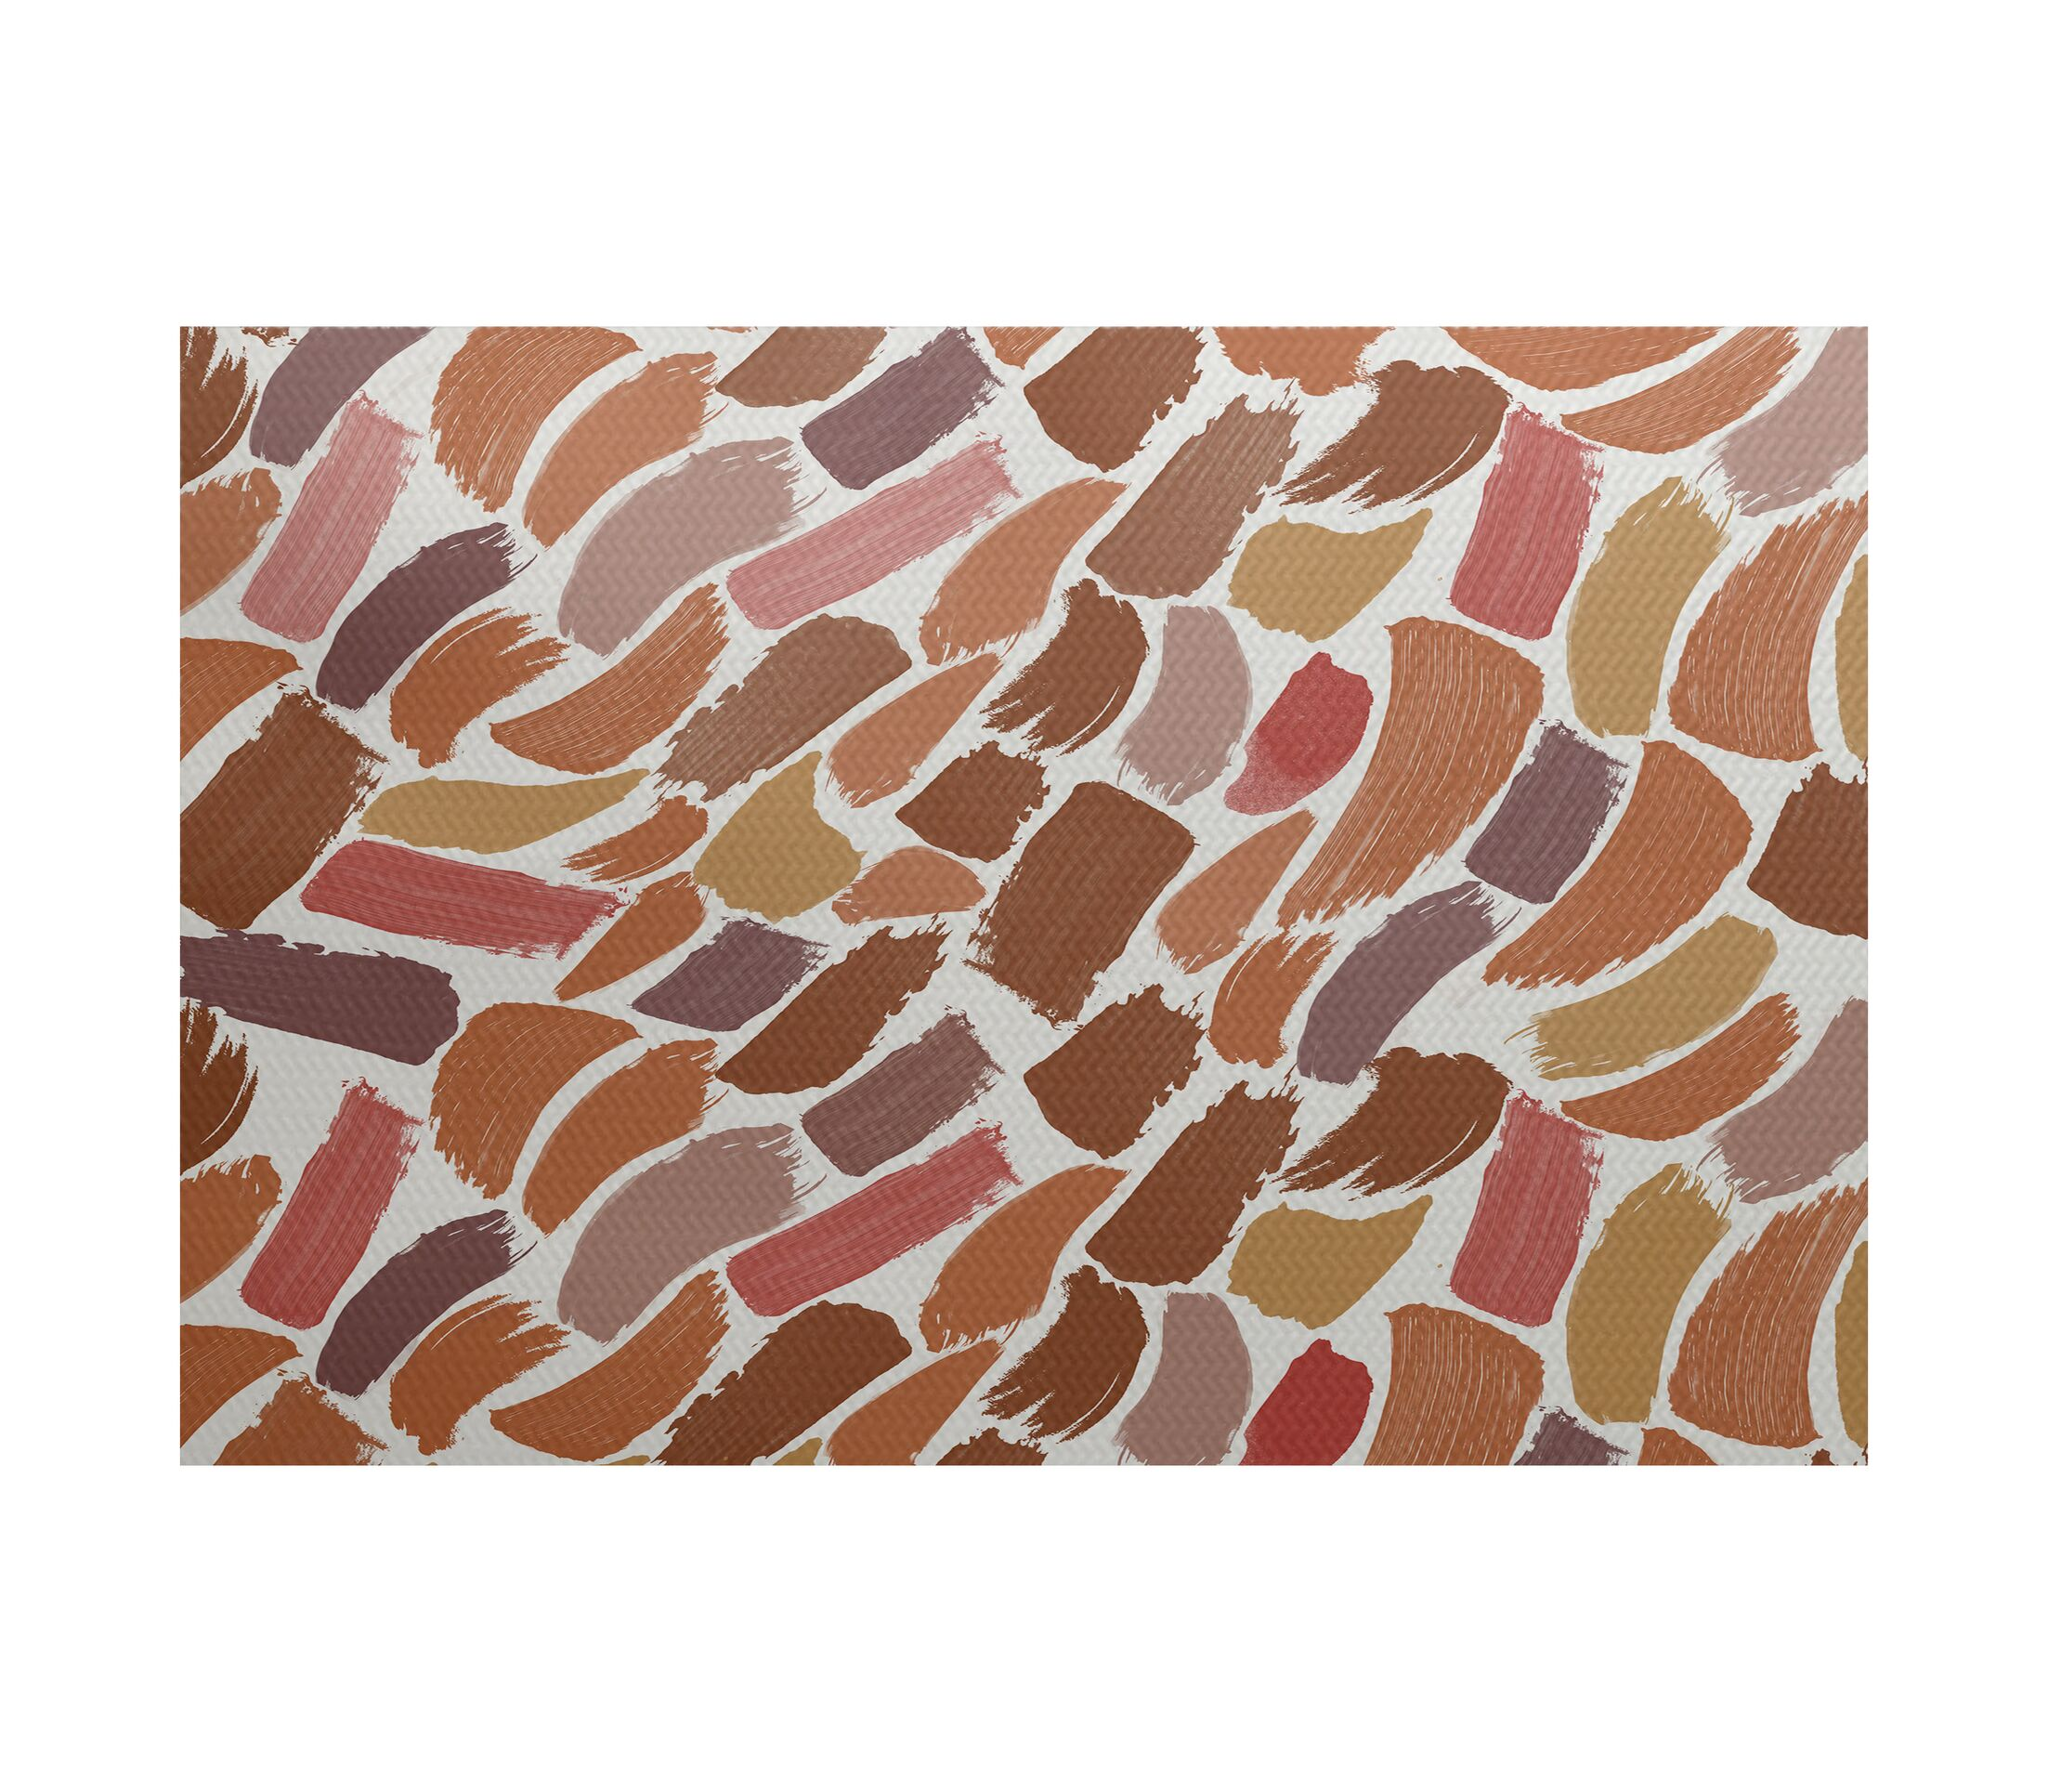 Goodlow Abstract Orange Area Rug Rug Size: Rectangle 5' x 7'